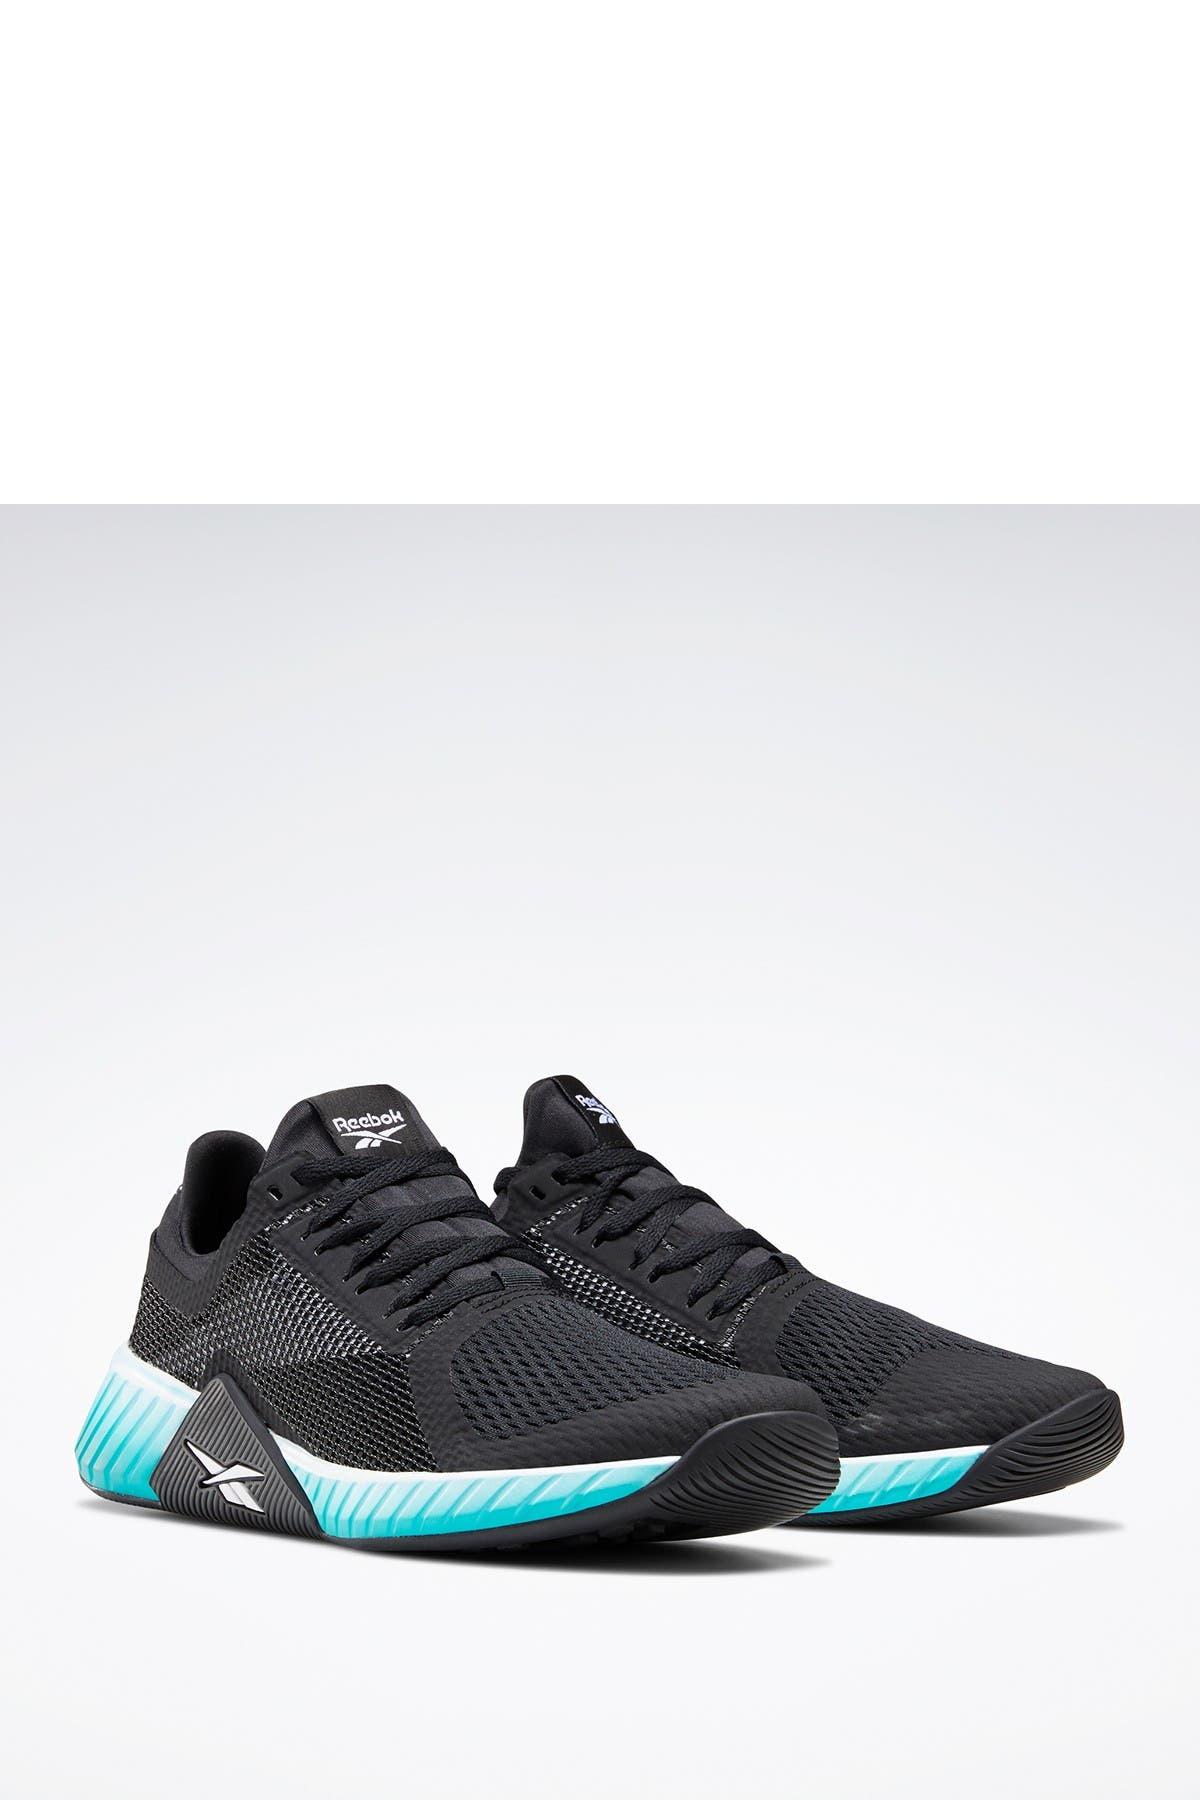 Image of Reebok Flashfilm Training Sneaker